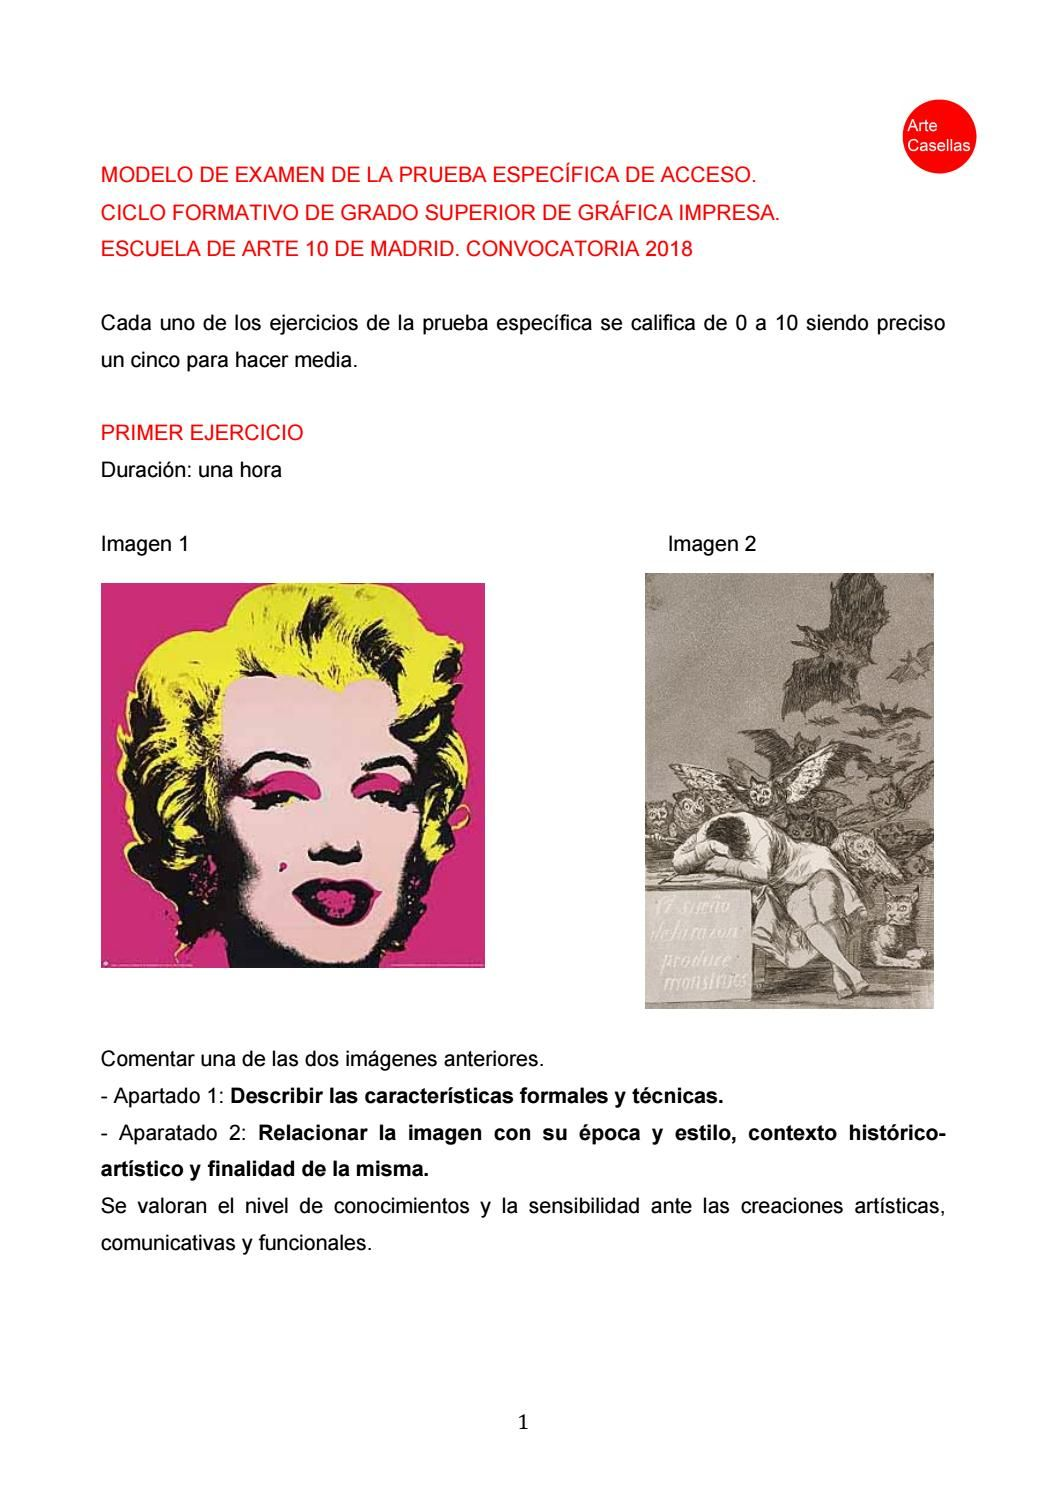 Modelo Examen Prueba Específica Artediez Gráfica Impresa 2018 Modelo De Examen Examen Imprimir Sobres